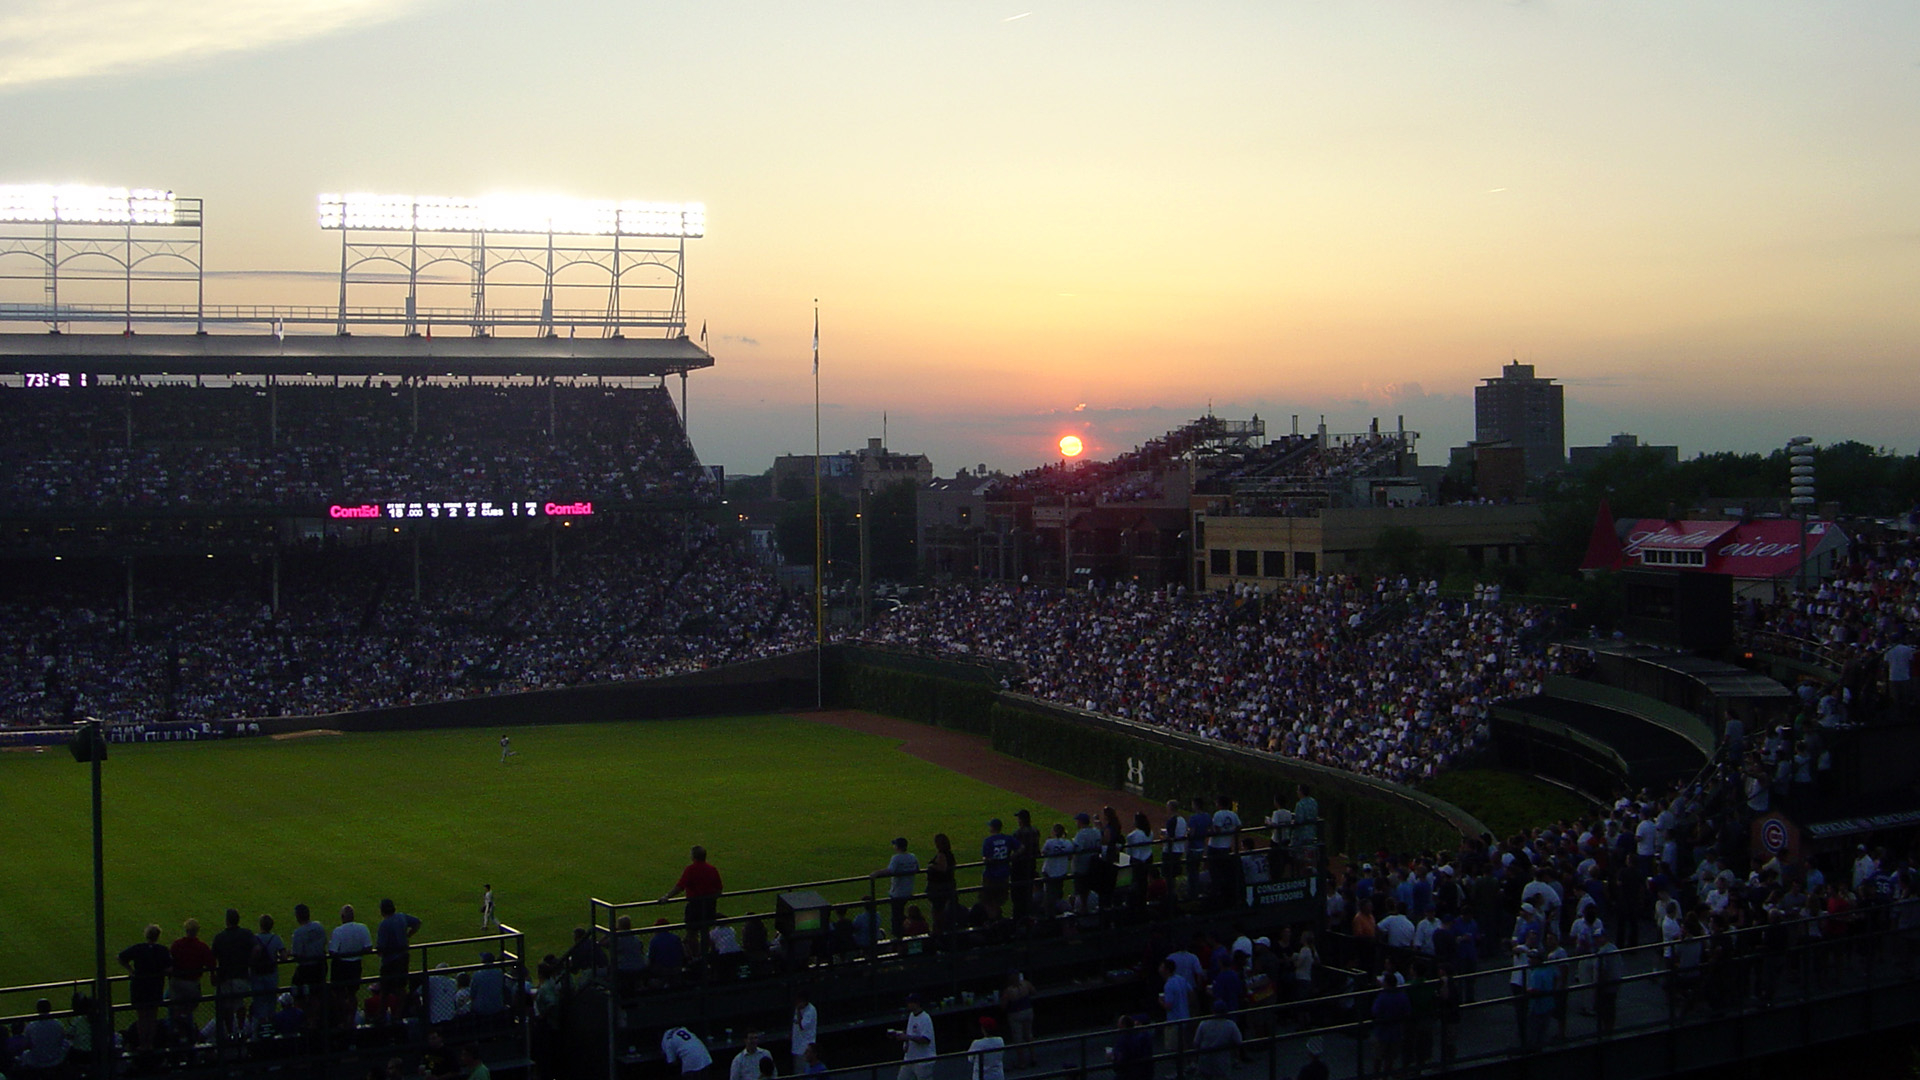 CHICAGO CUBS mlb baseball 53 wallpaper 1920x1080 232571 1920x1080